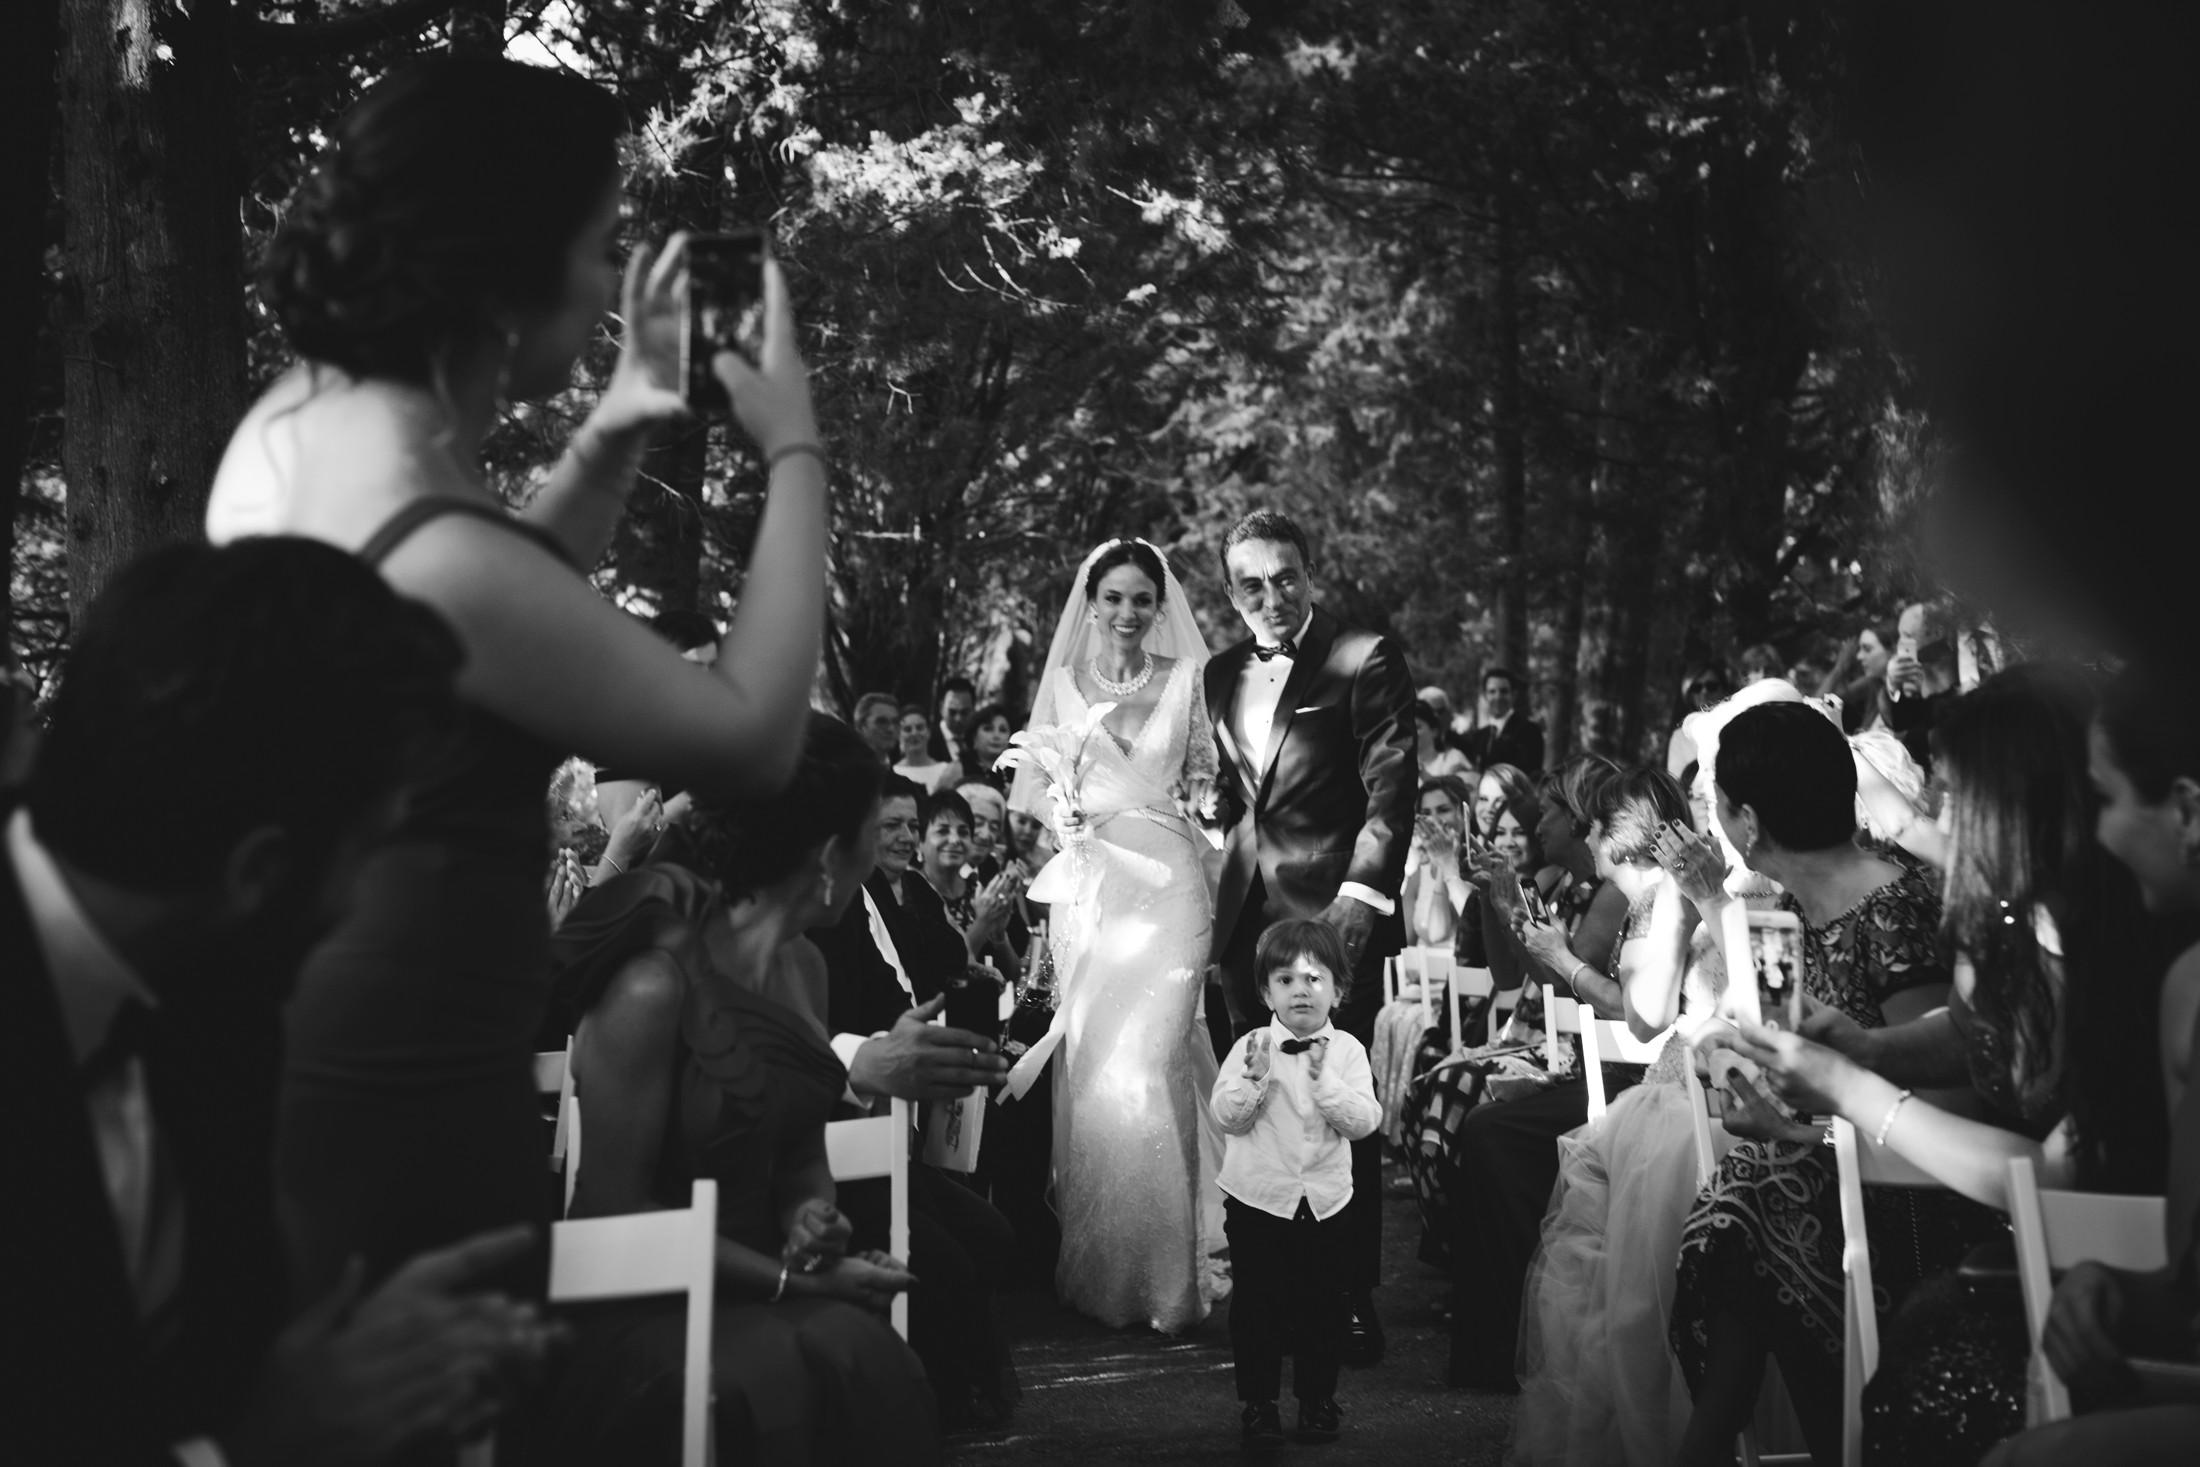 luxury wedding the bride walking down the aisle in villa cimbrone ravello